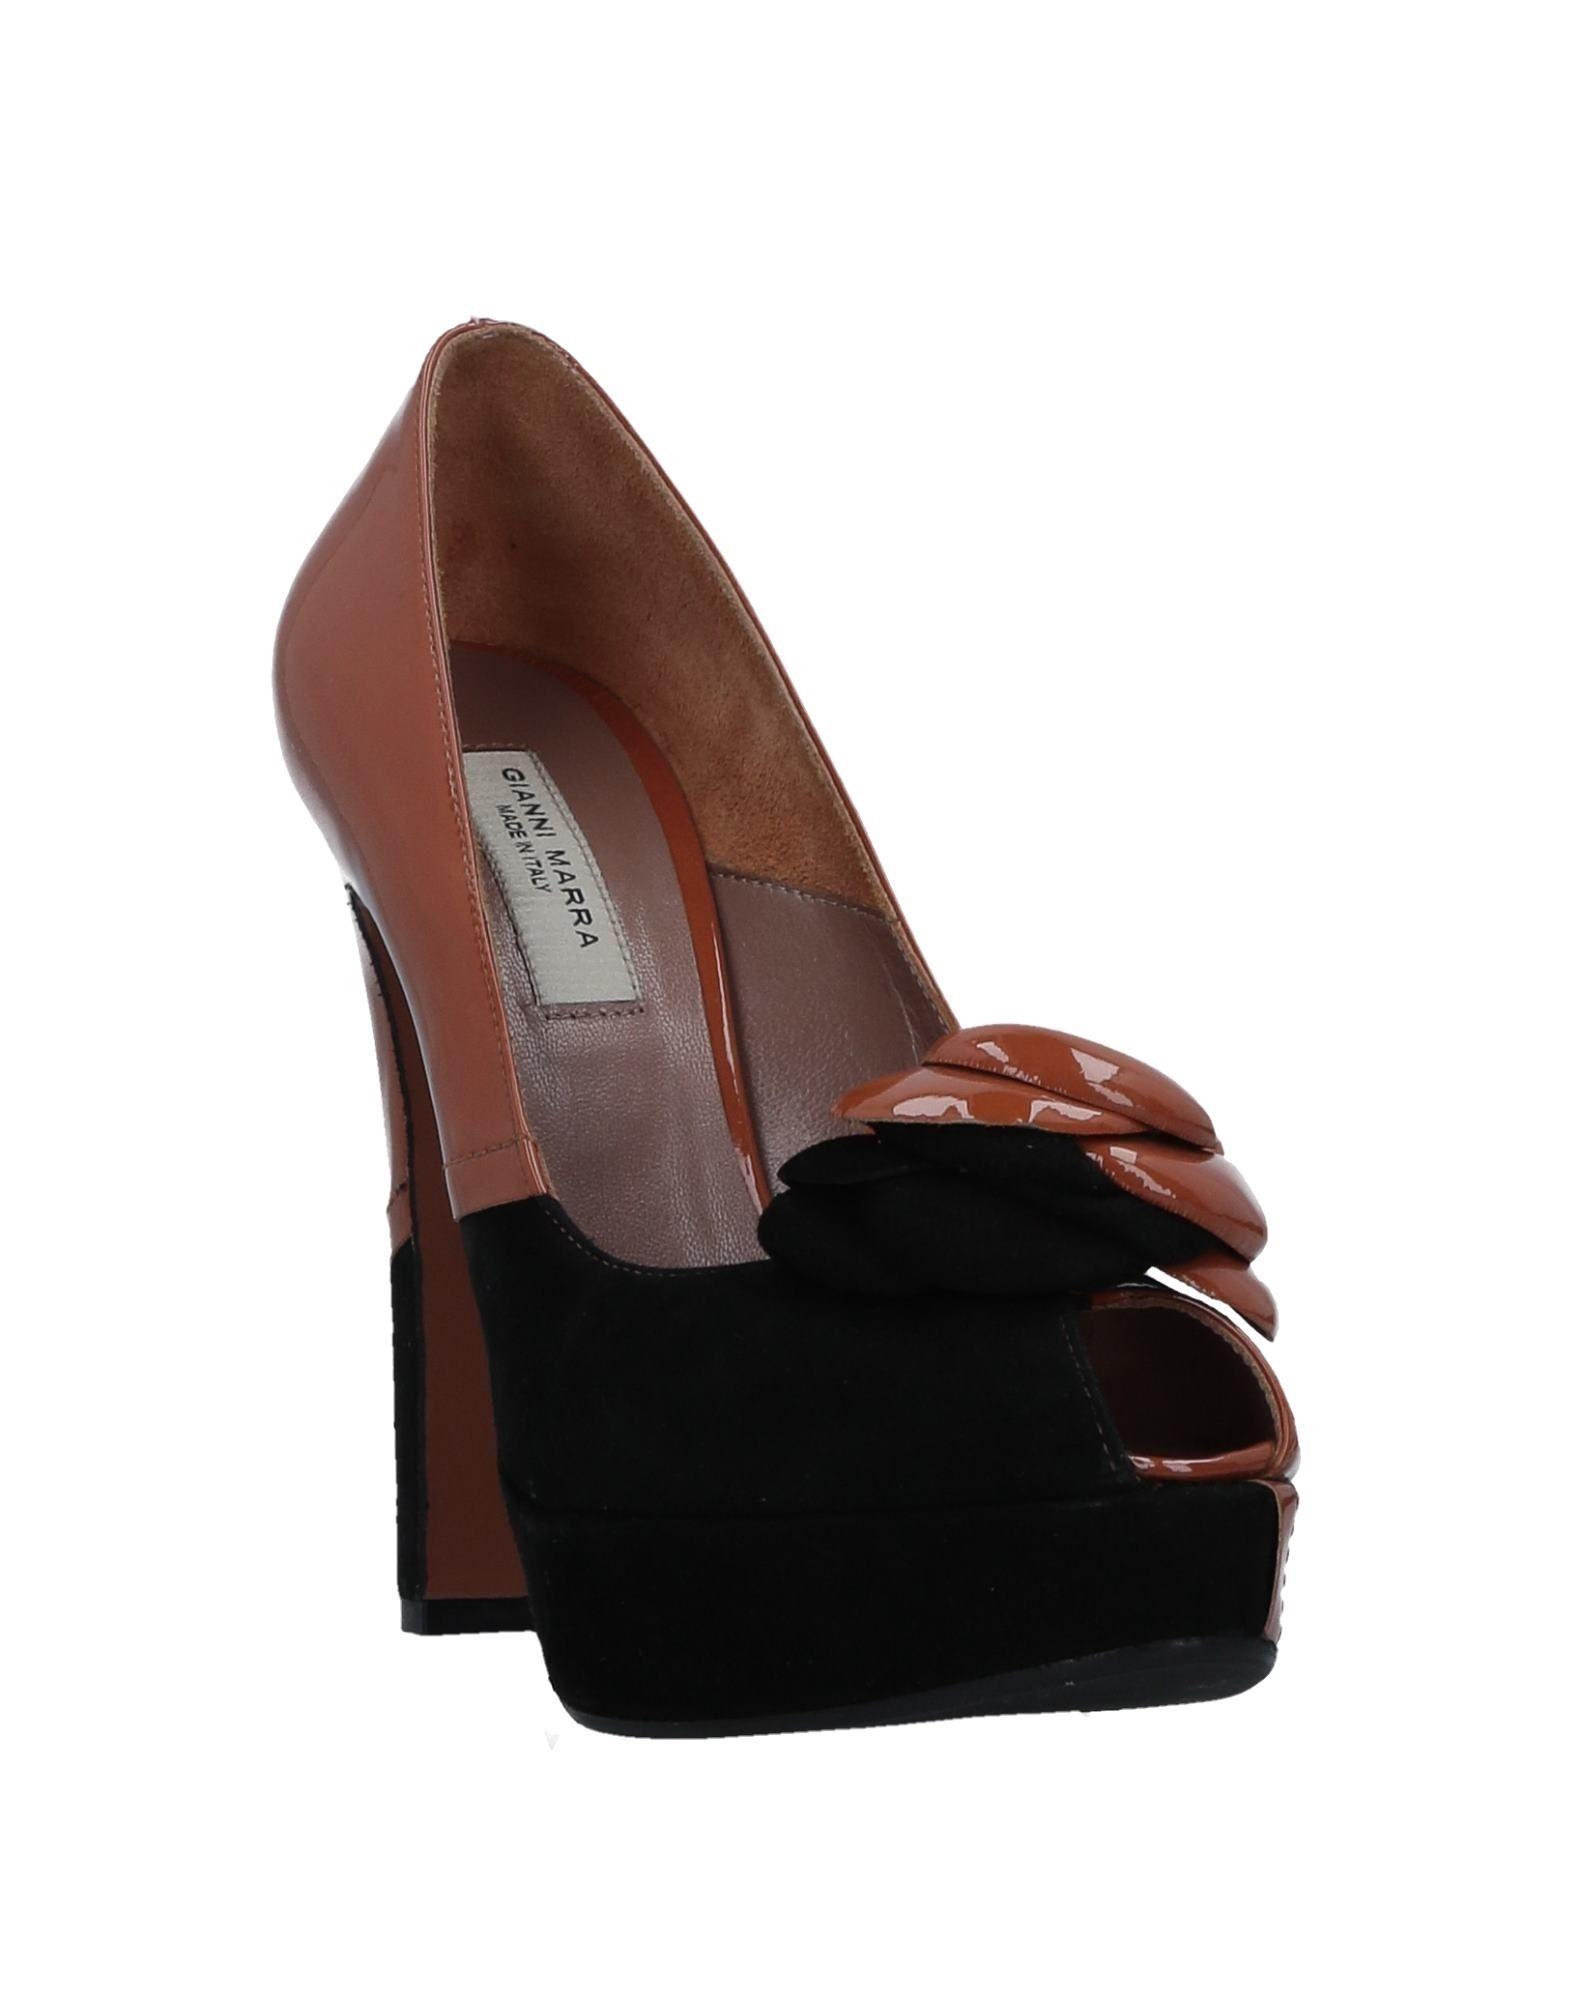 Stilvolle Marra billige Schuhe Gianni Marra Stilvolle Pumps Damen  11525200TH 550b1b